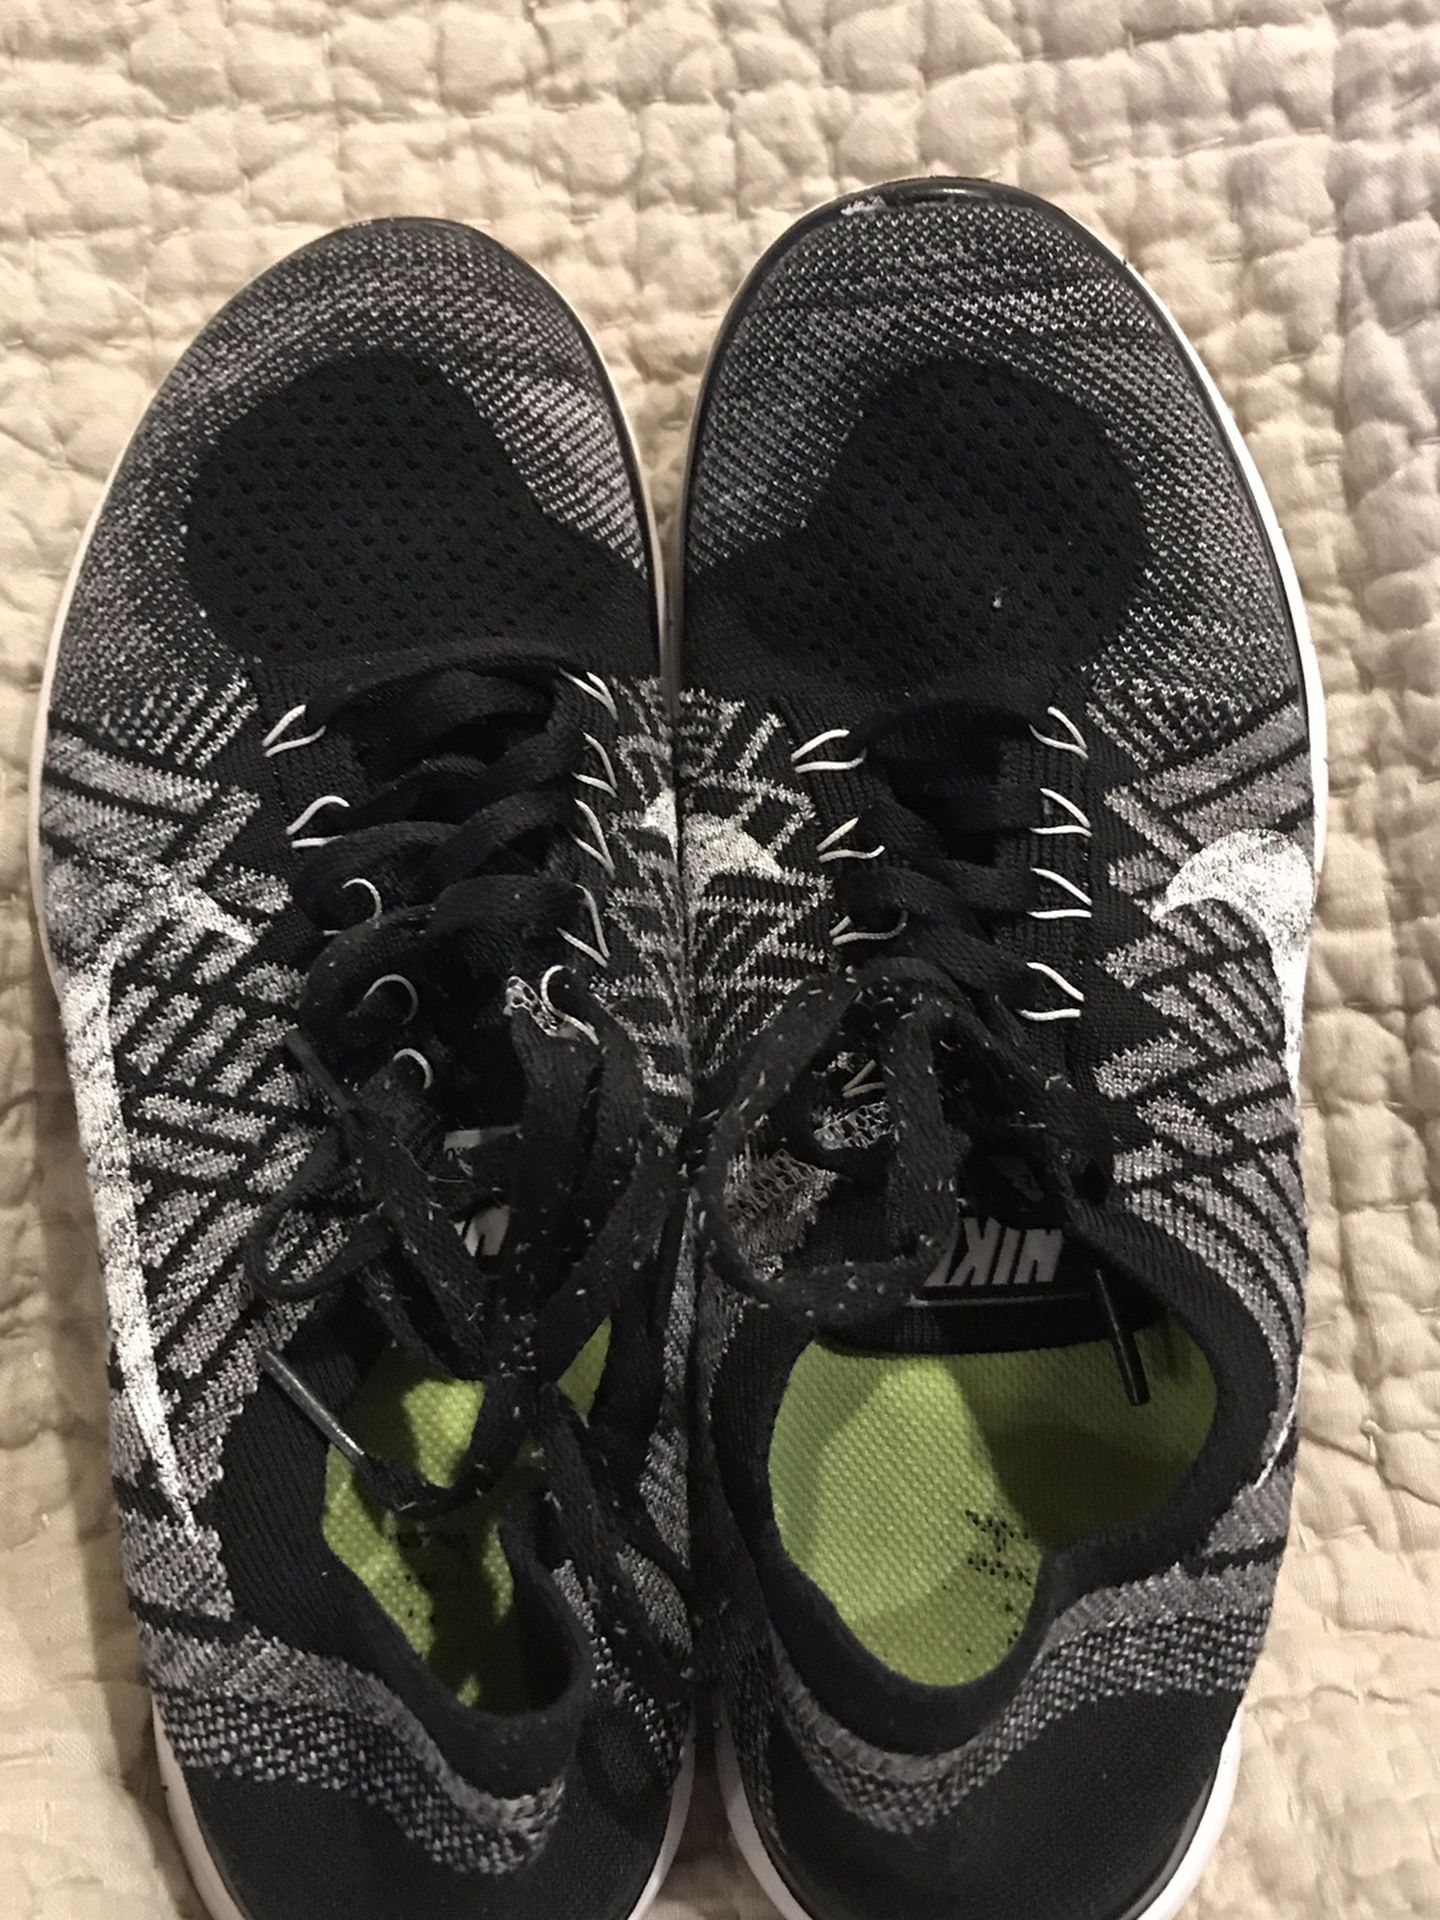 Nike Fly knit 4.0